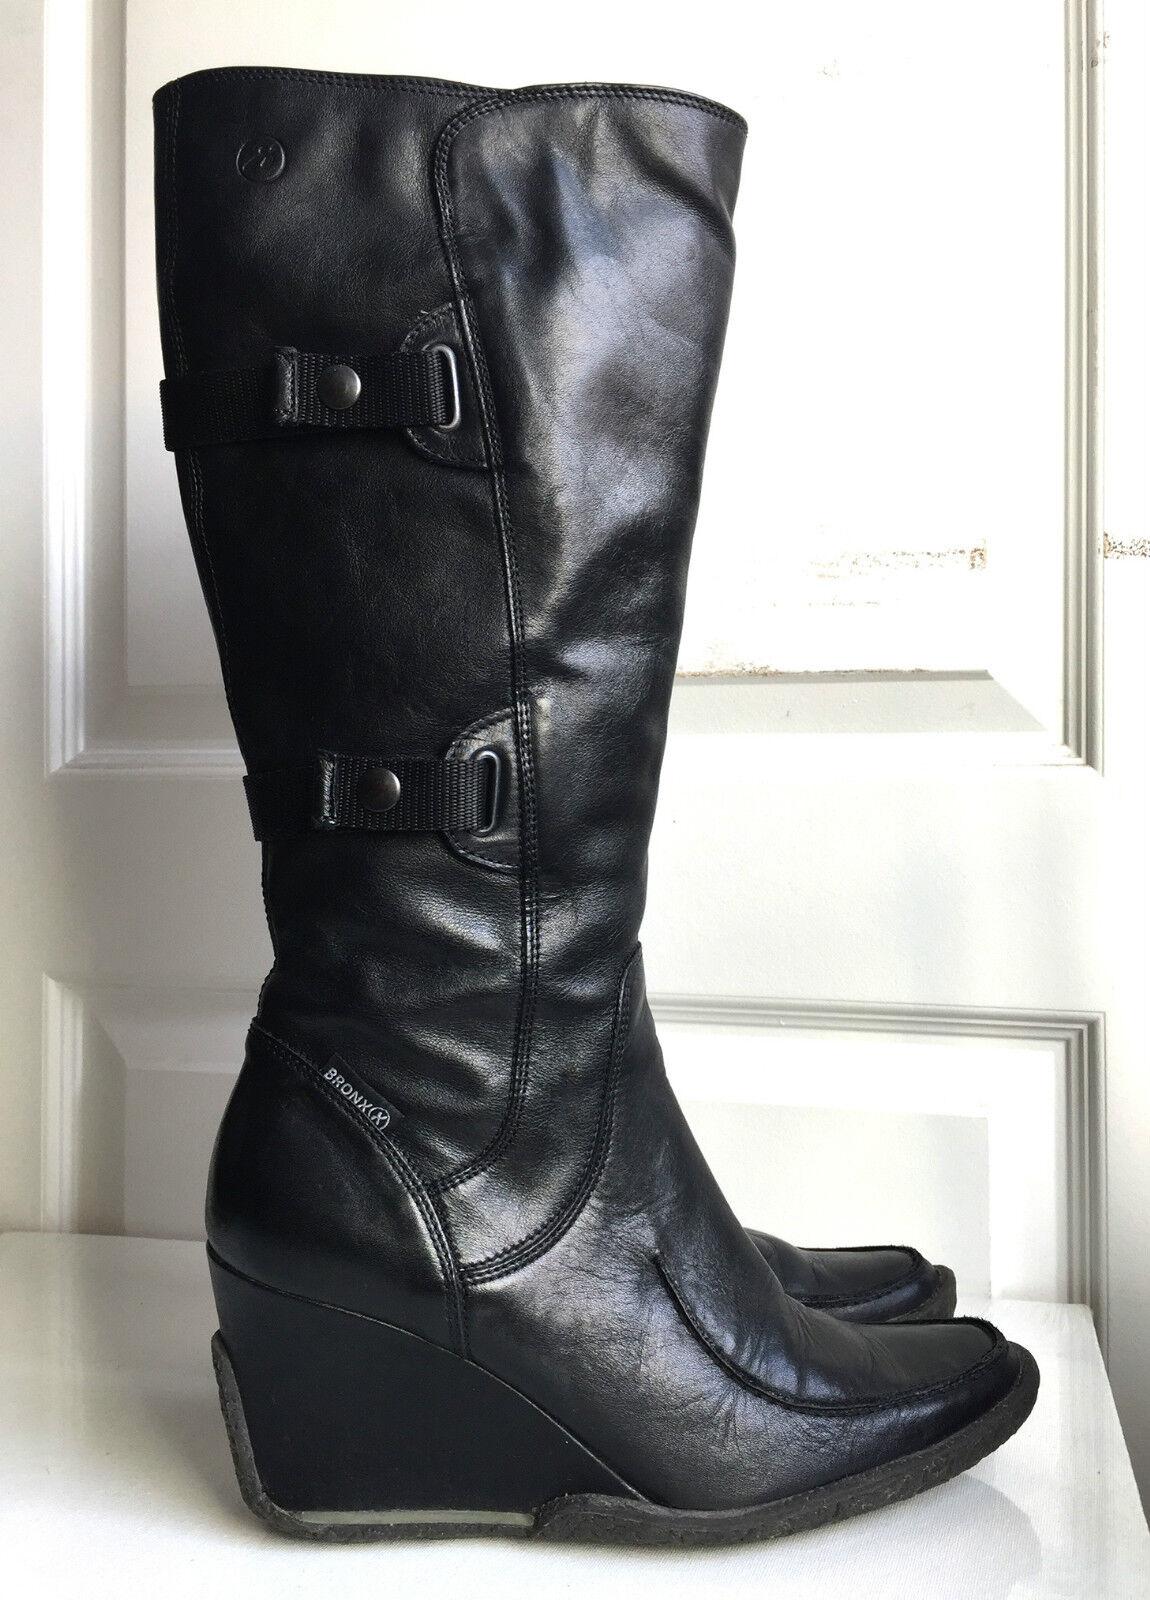 Bronx schuhe Damens's April schwarz Leder wedge boots Größe 39